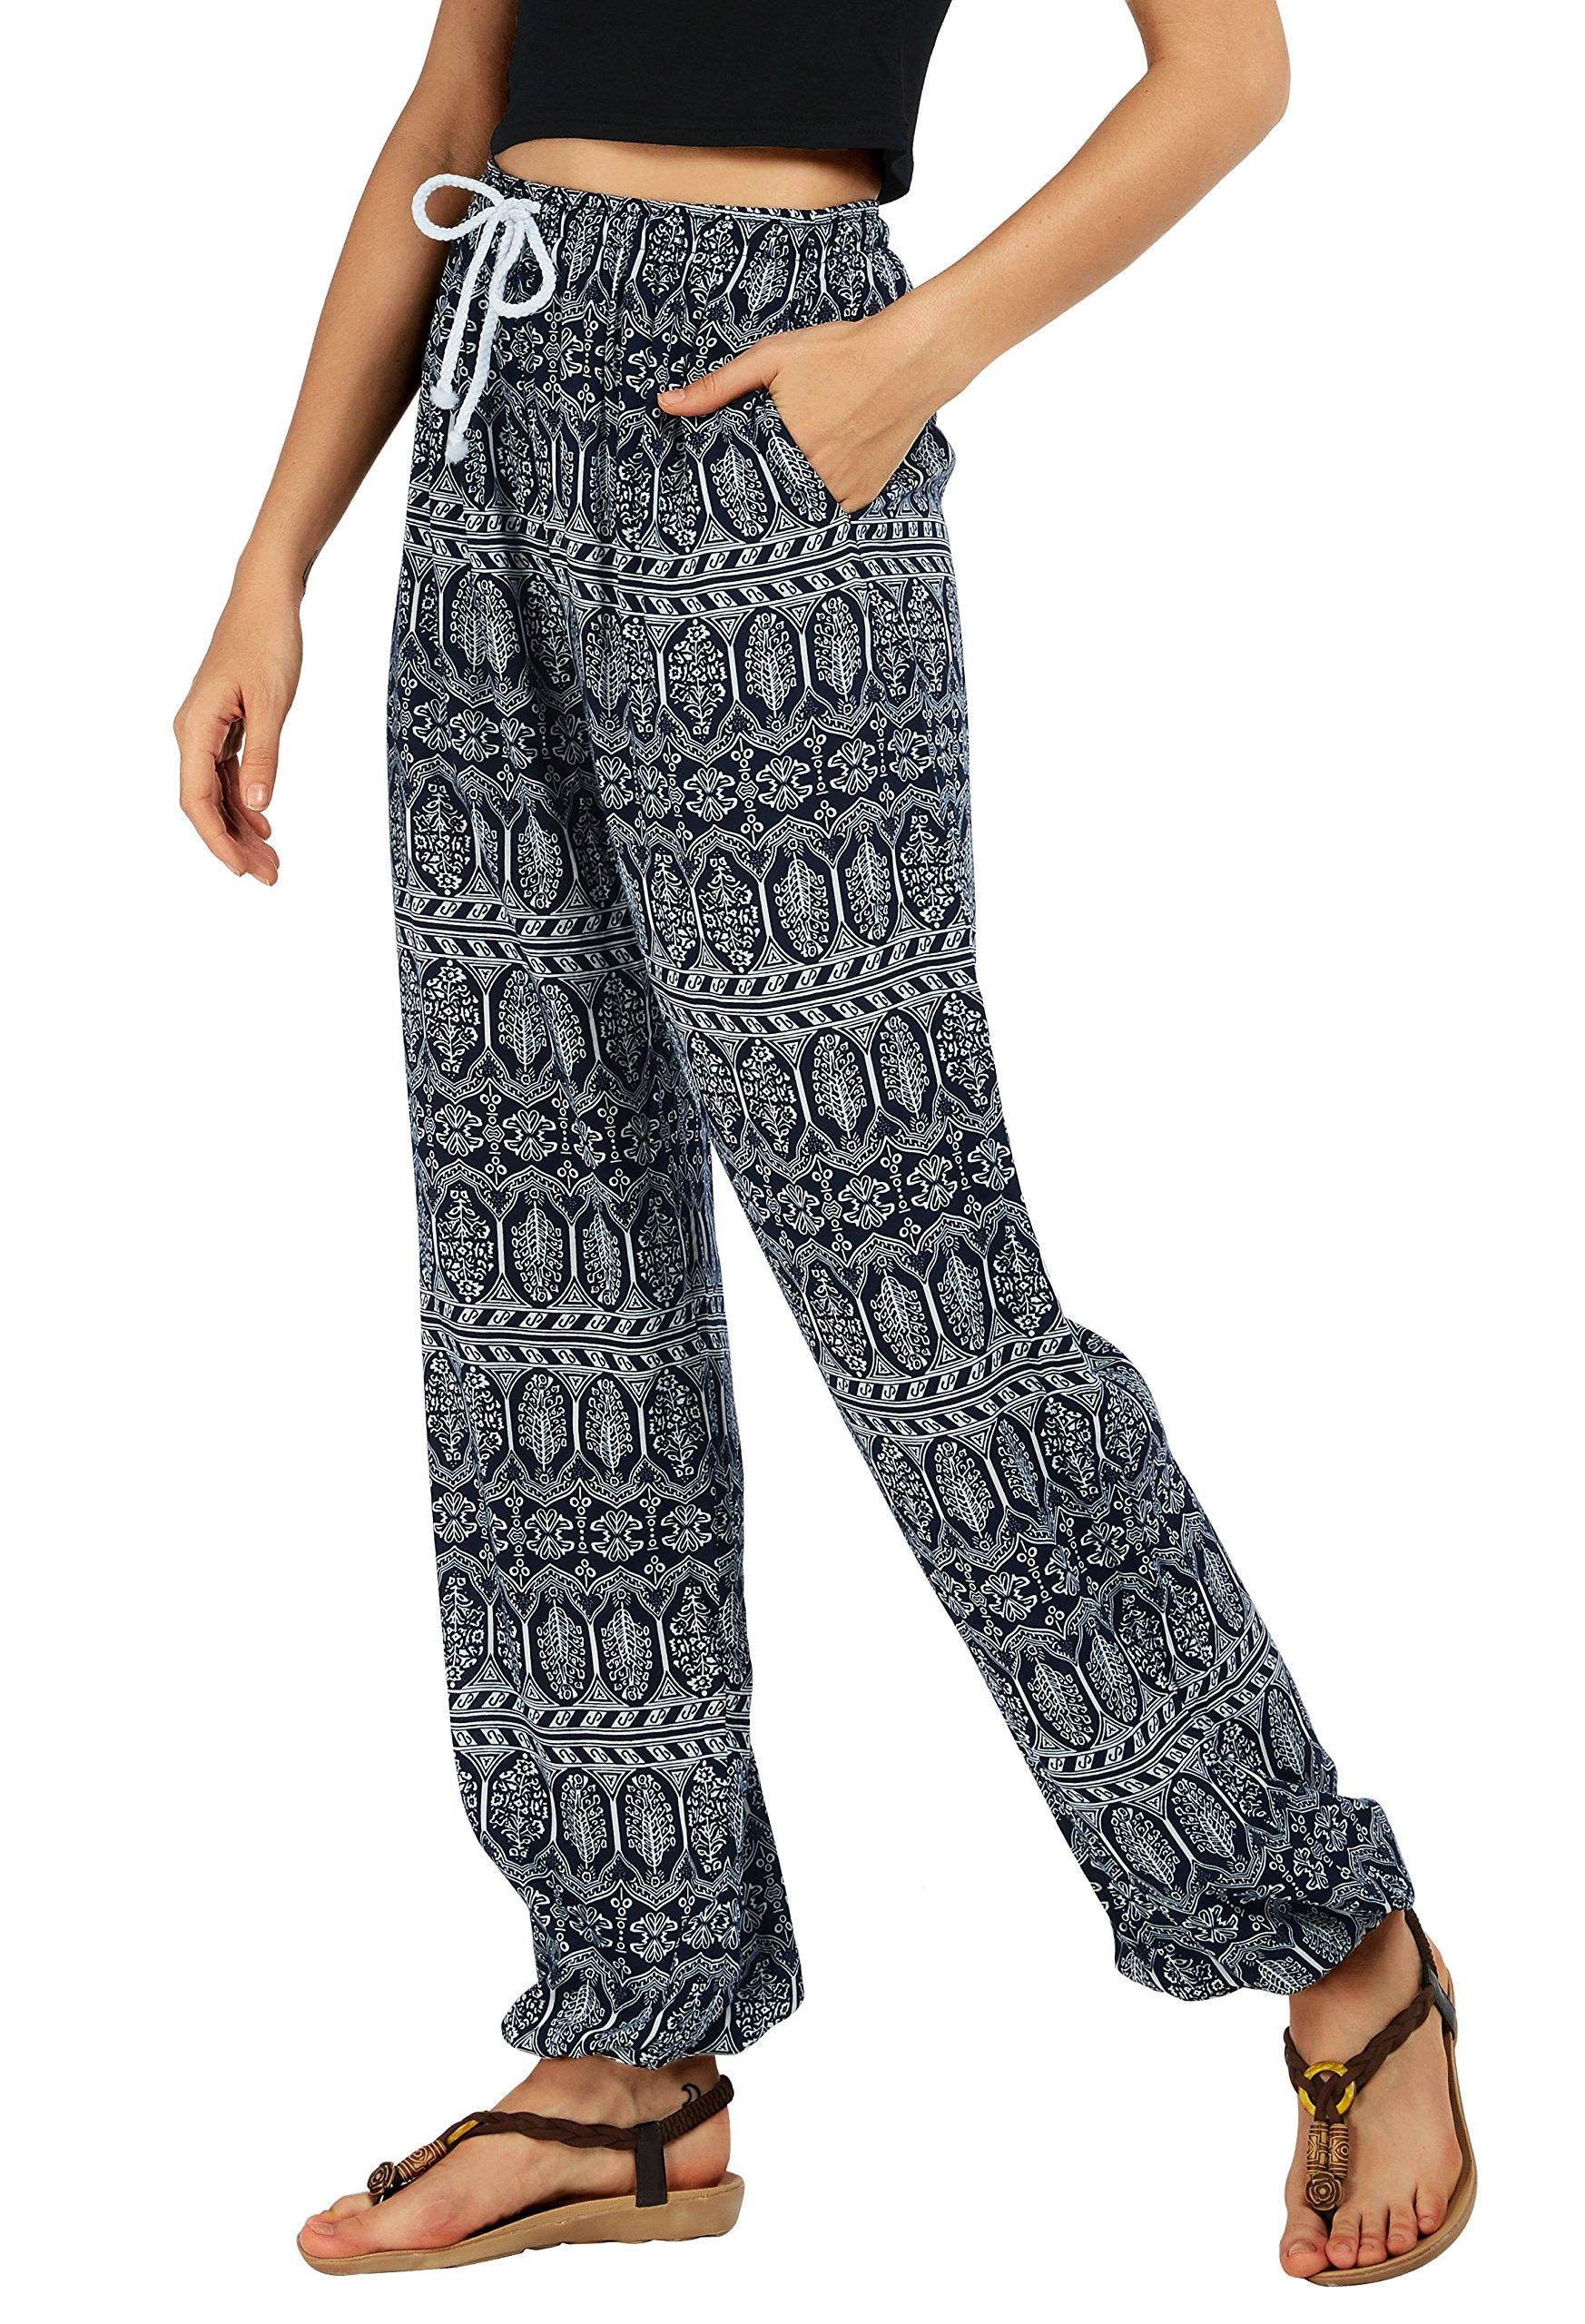 Urban CoCo Women's Floral Print Boho Yoga Pants Harem Pants Jogger Pants (L, 2)